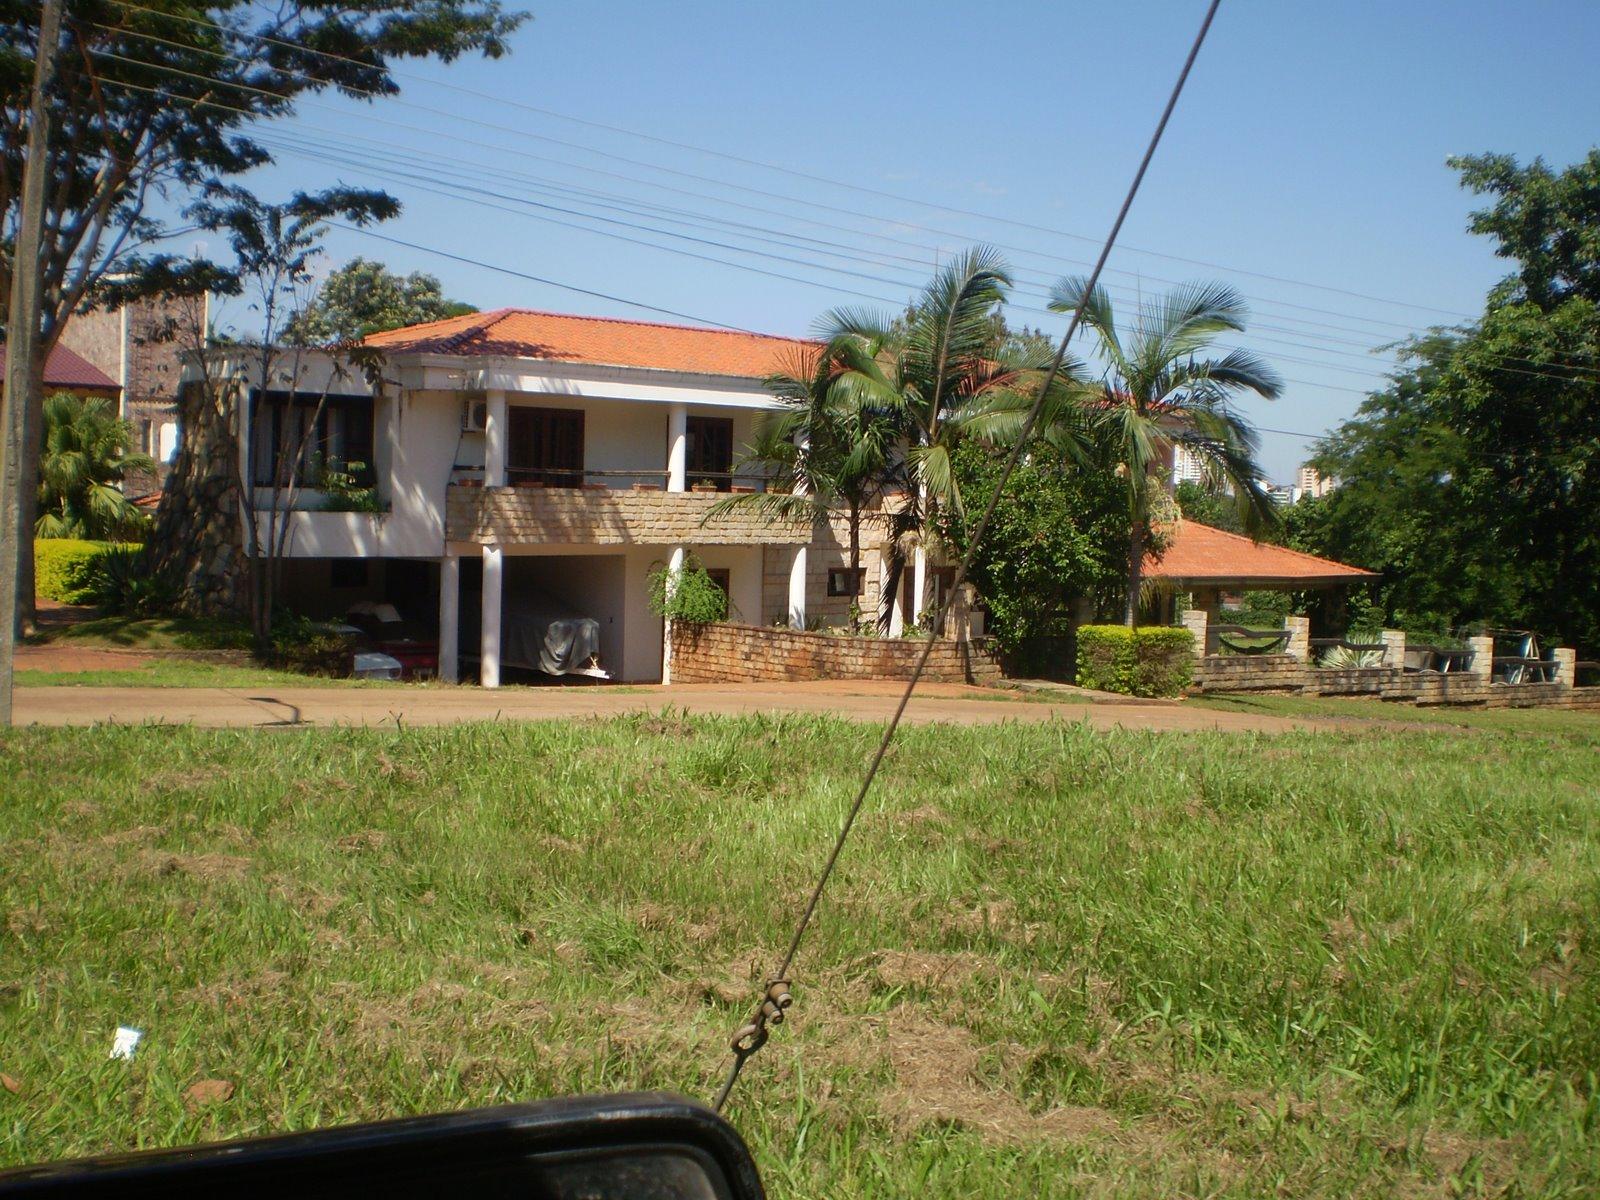 Paraguay Auswandern IMMOBILIEN KAUFEN MIETEN PARAGUAY